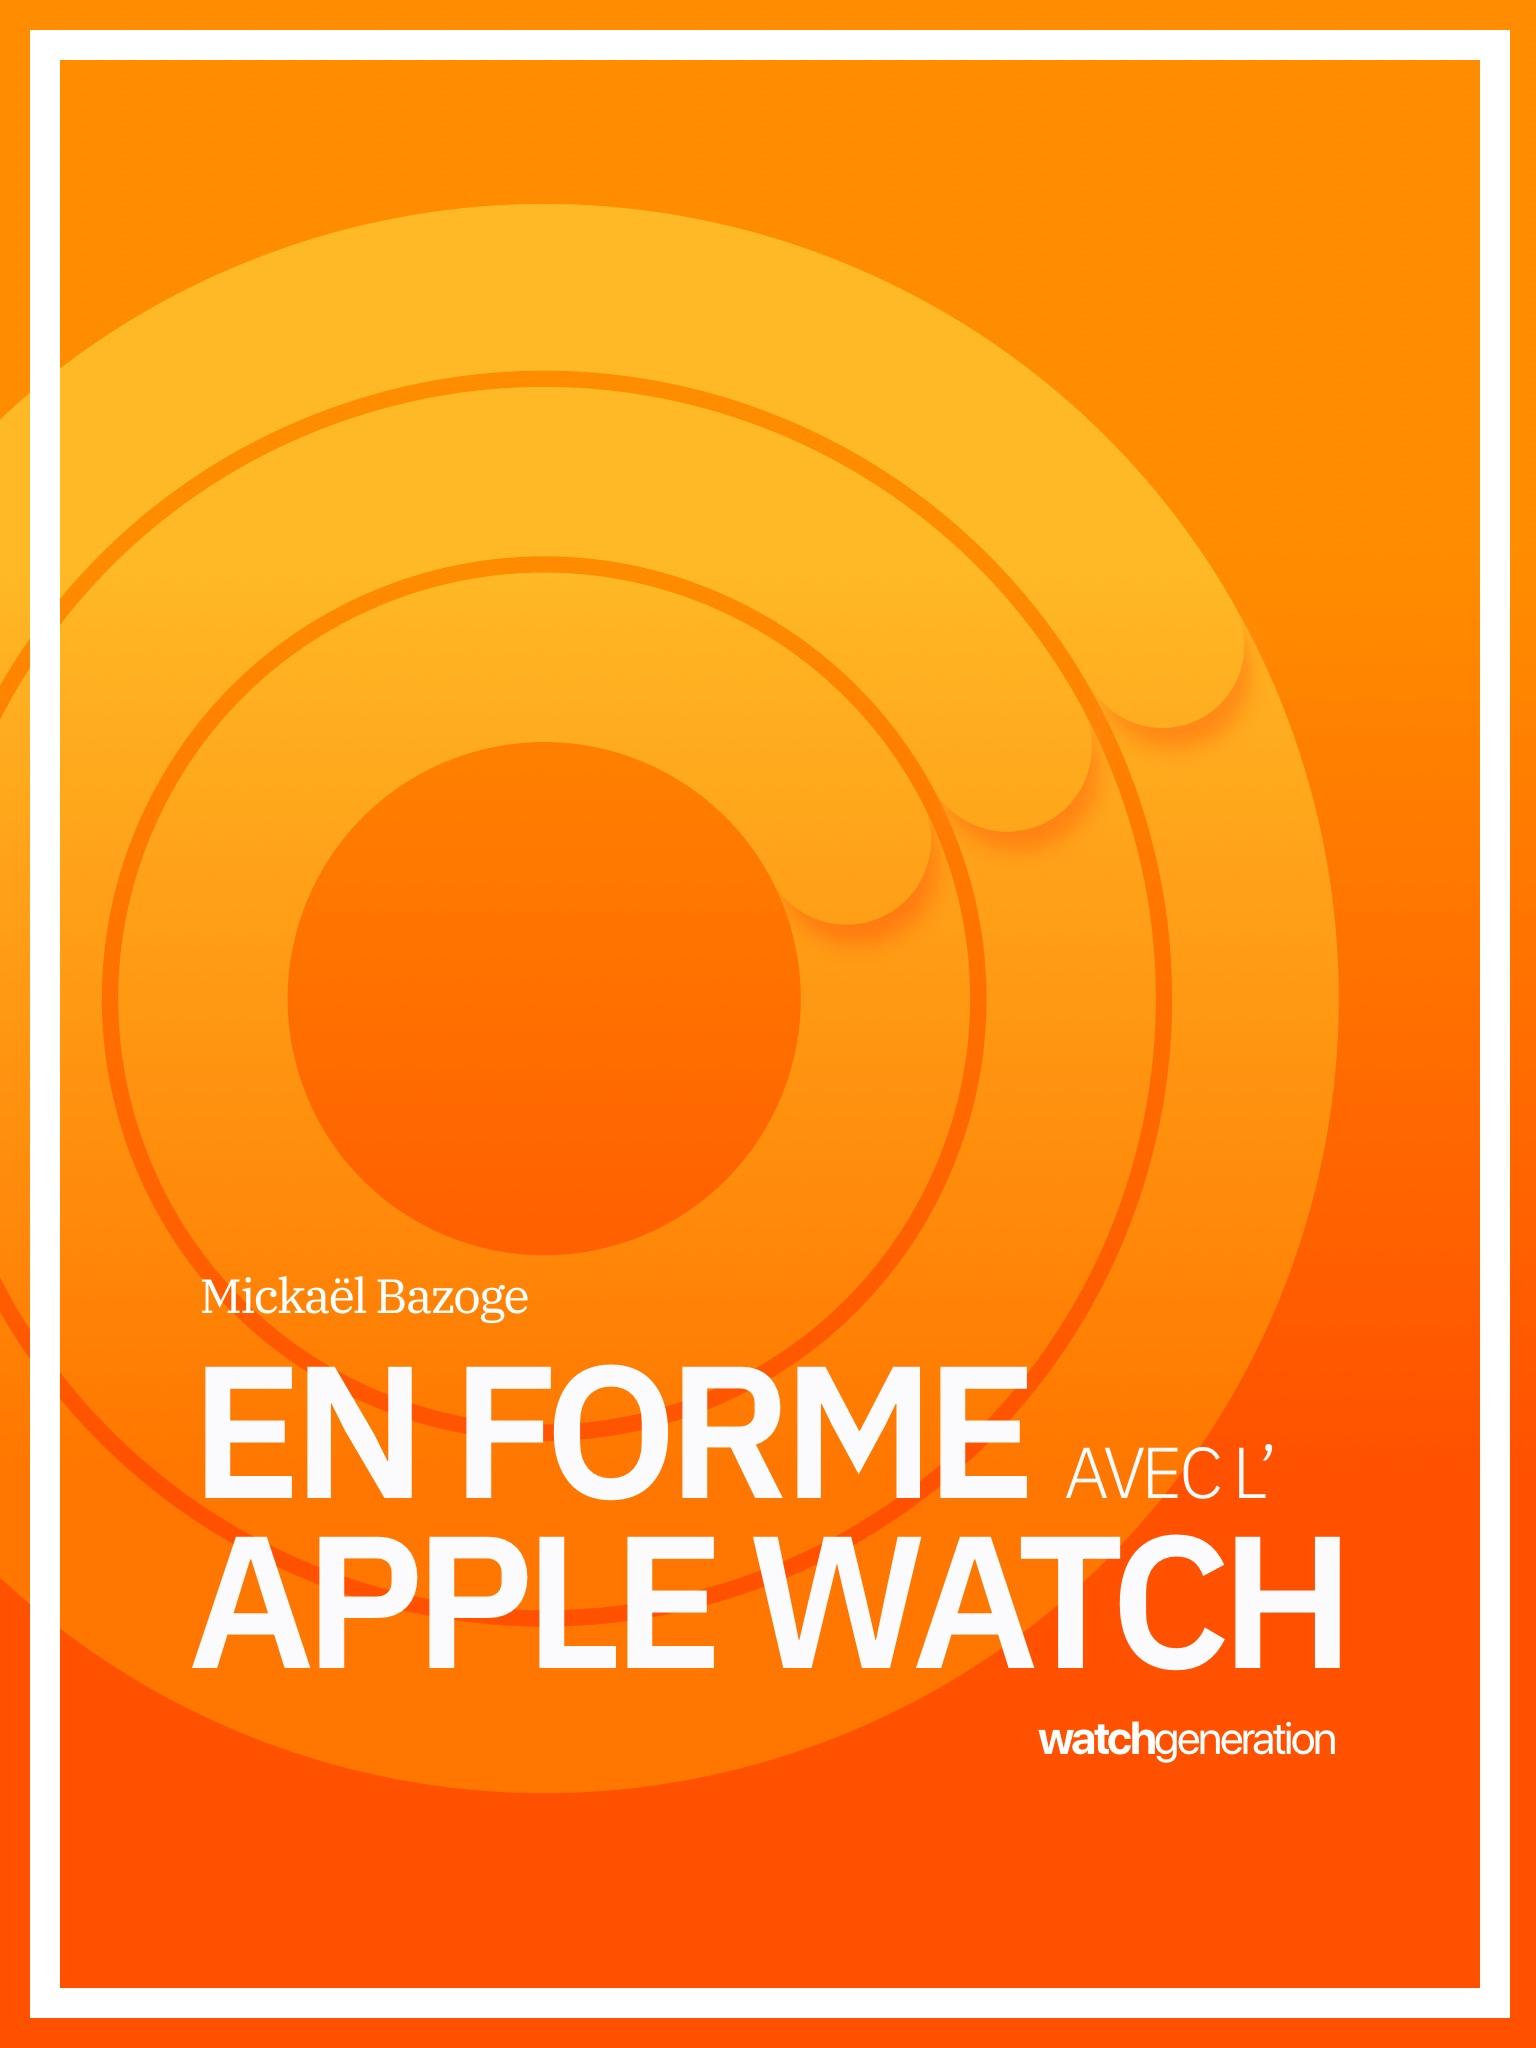 livres/savoir-watch.jpg